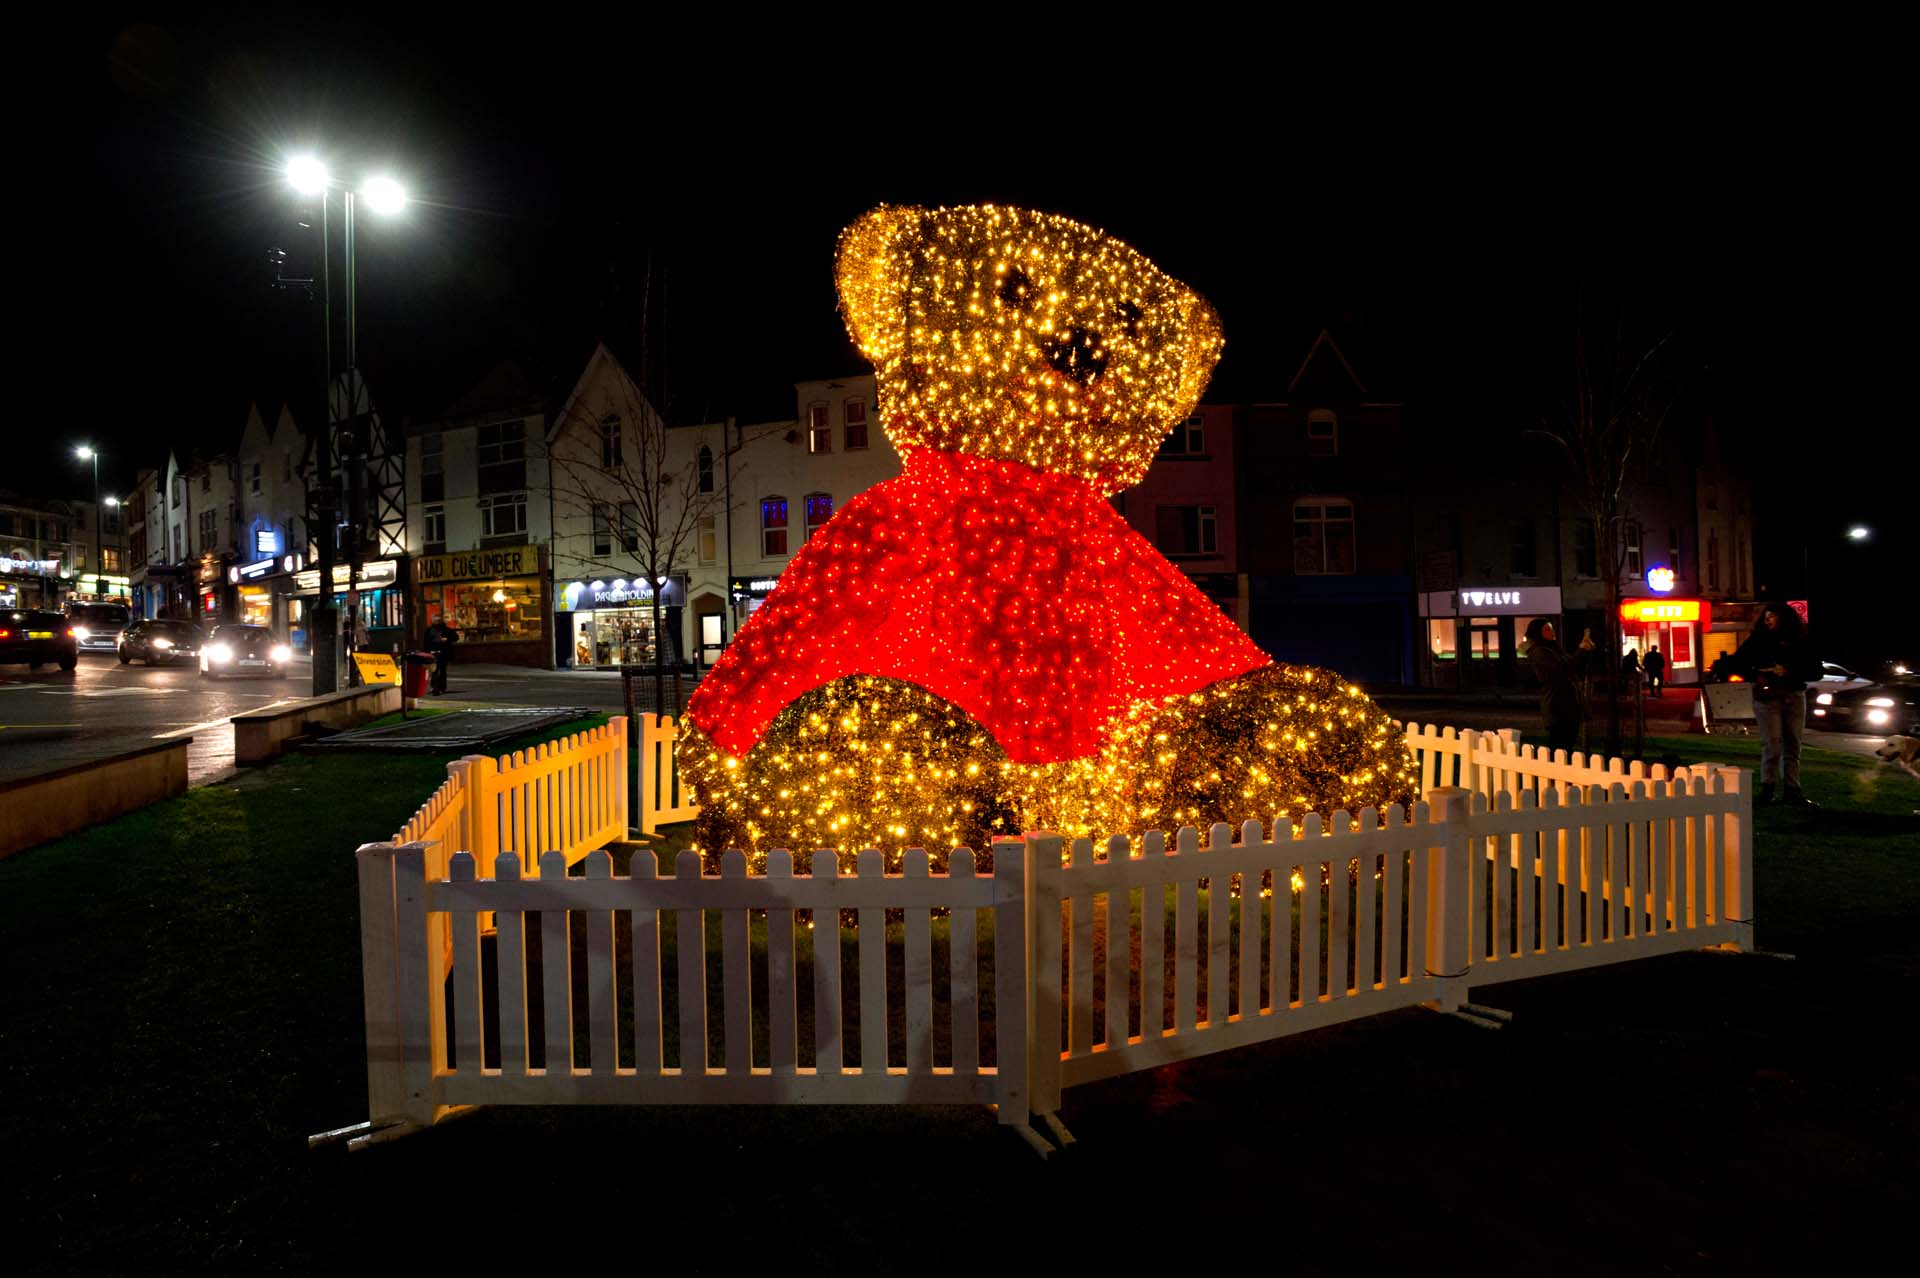 Giant Teddy Bear illuminating the night sky in Bournemouth's Triangle